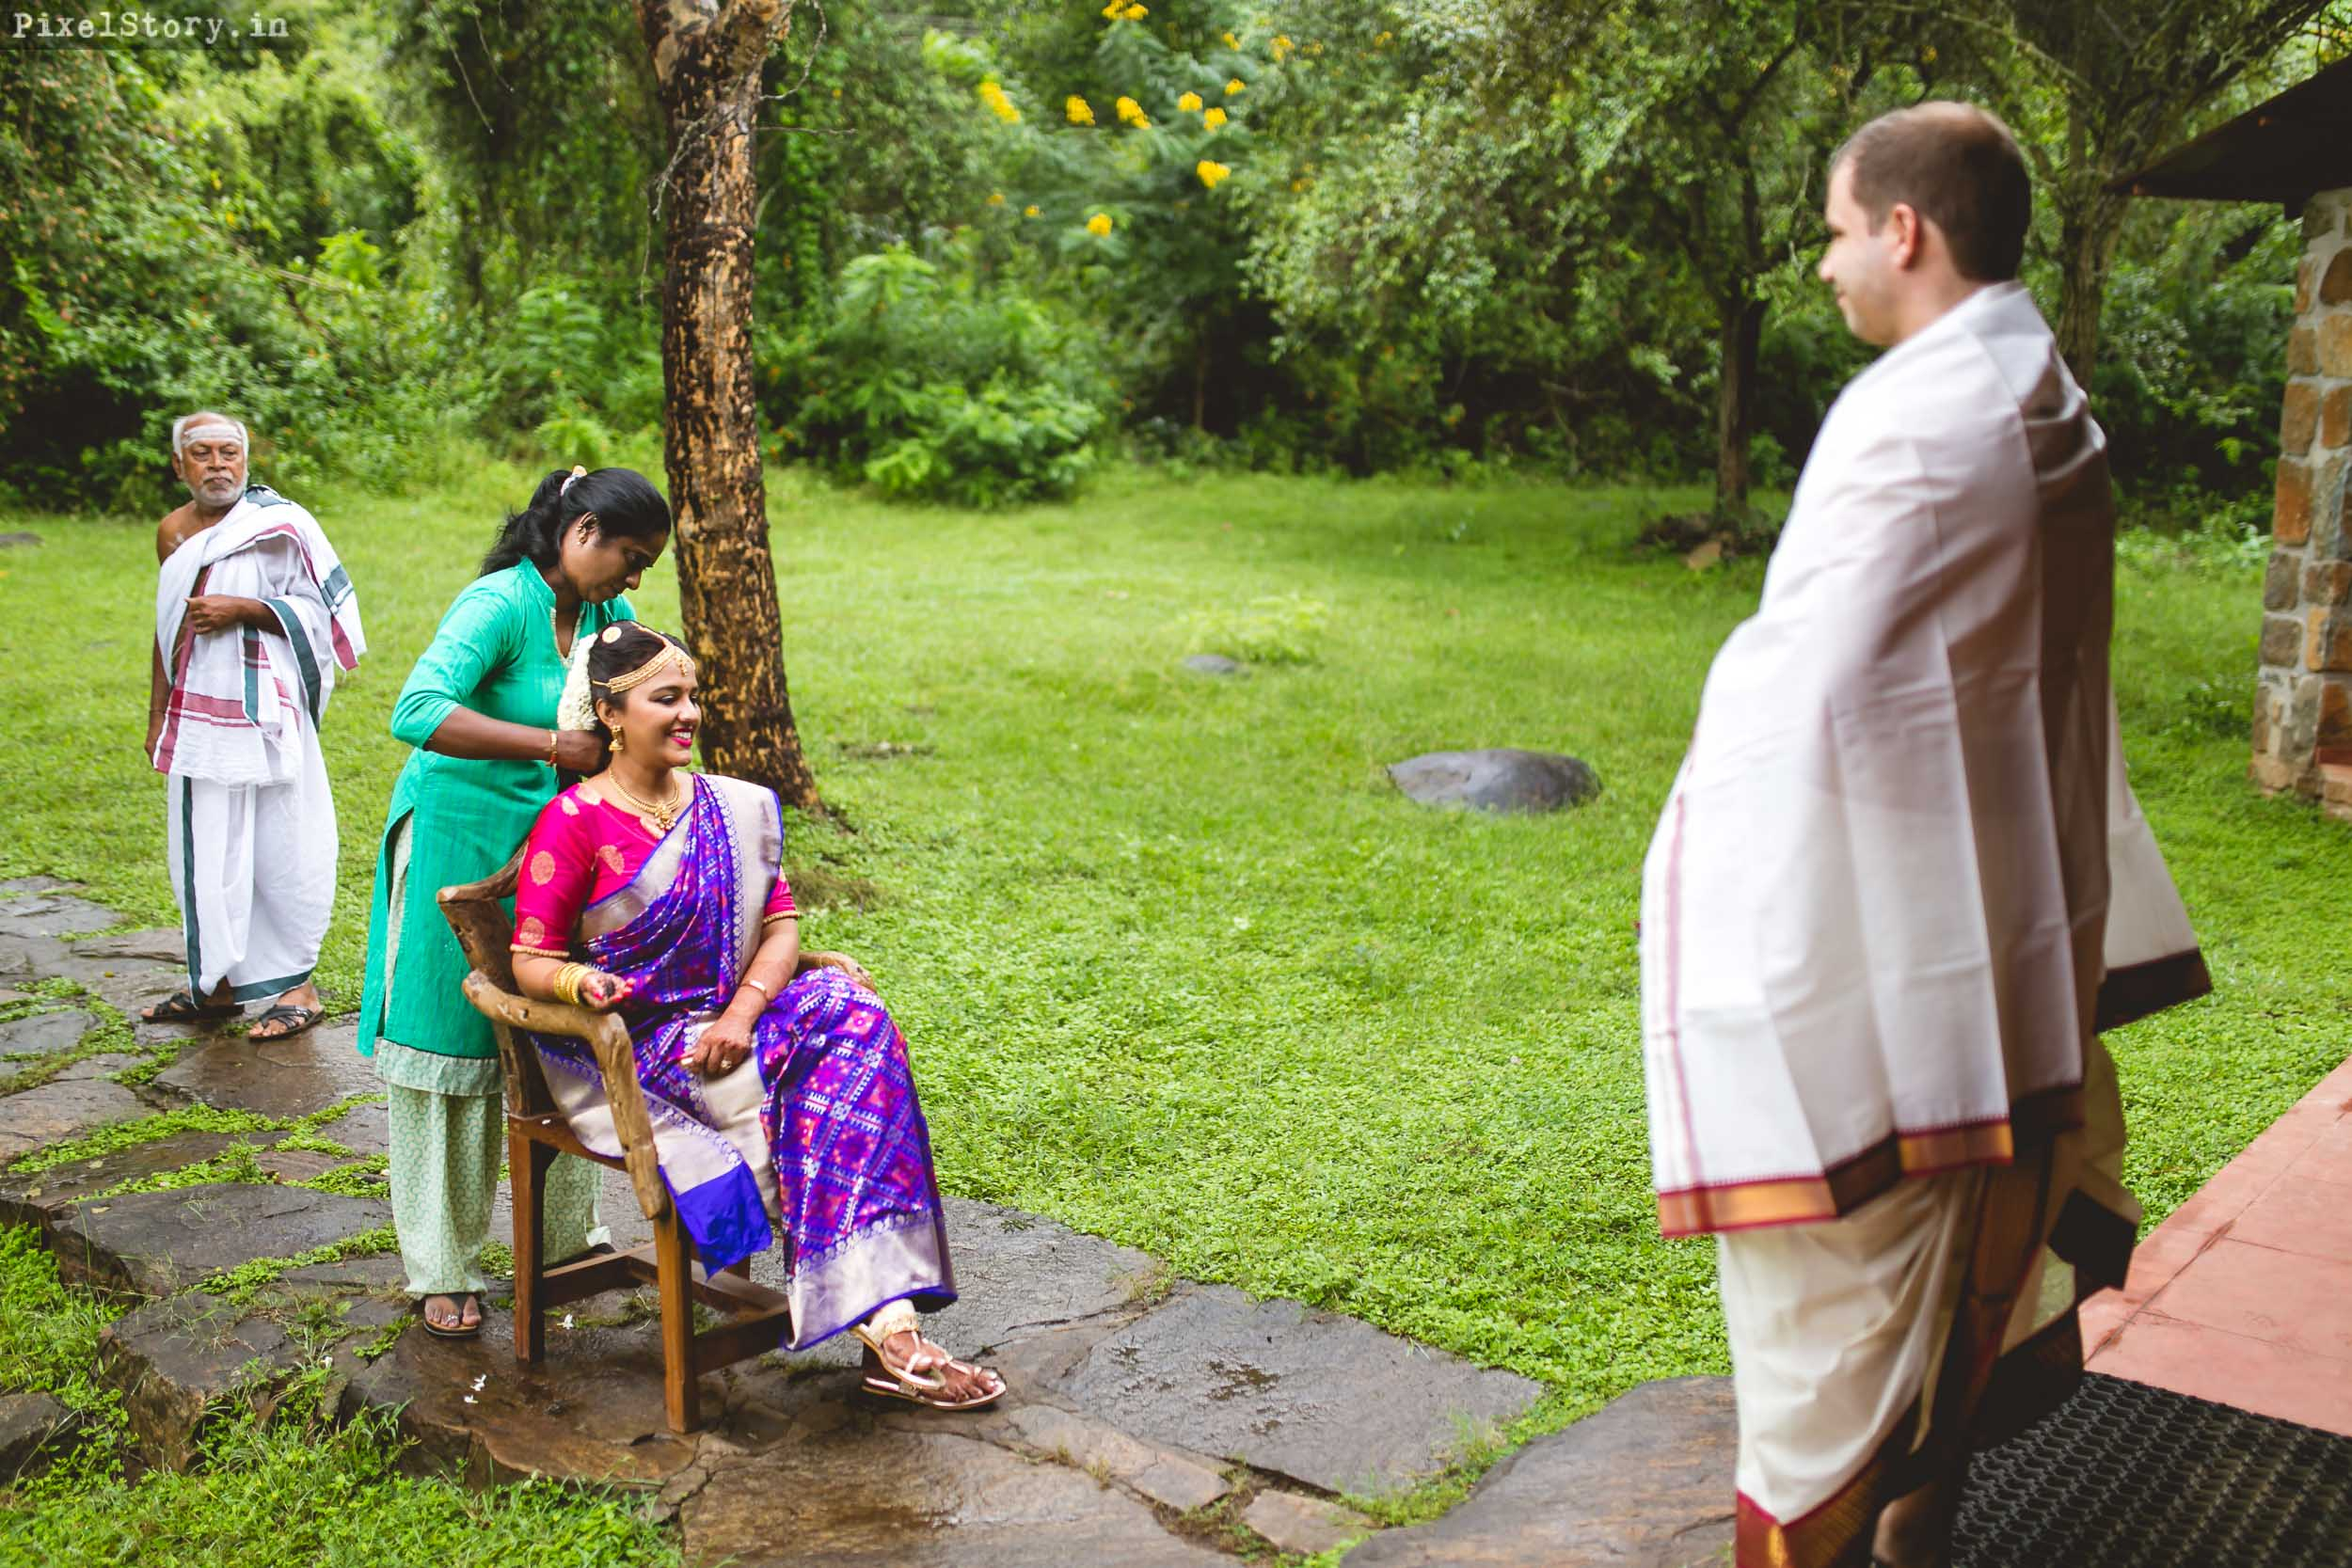 PixelStory-Jungle-Wedding-Photographer-Masinagudi-Indo-French015.jpg